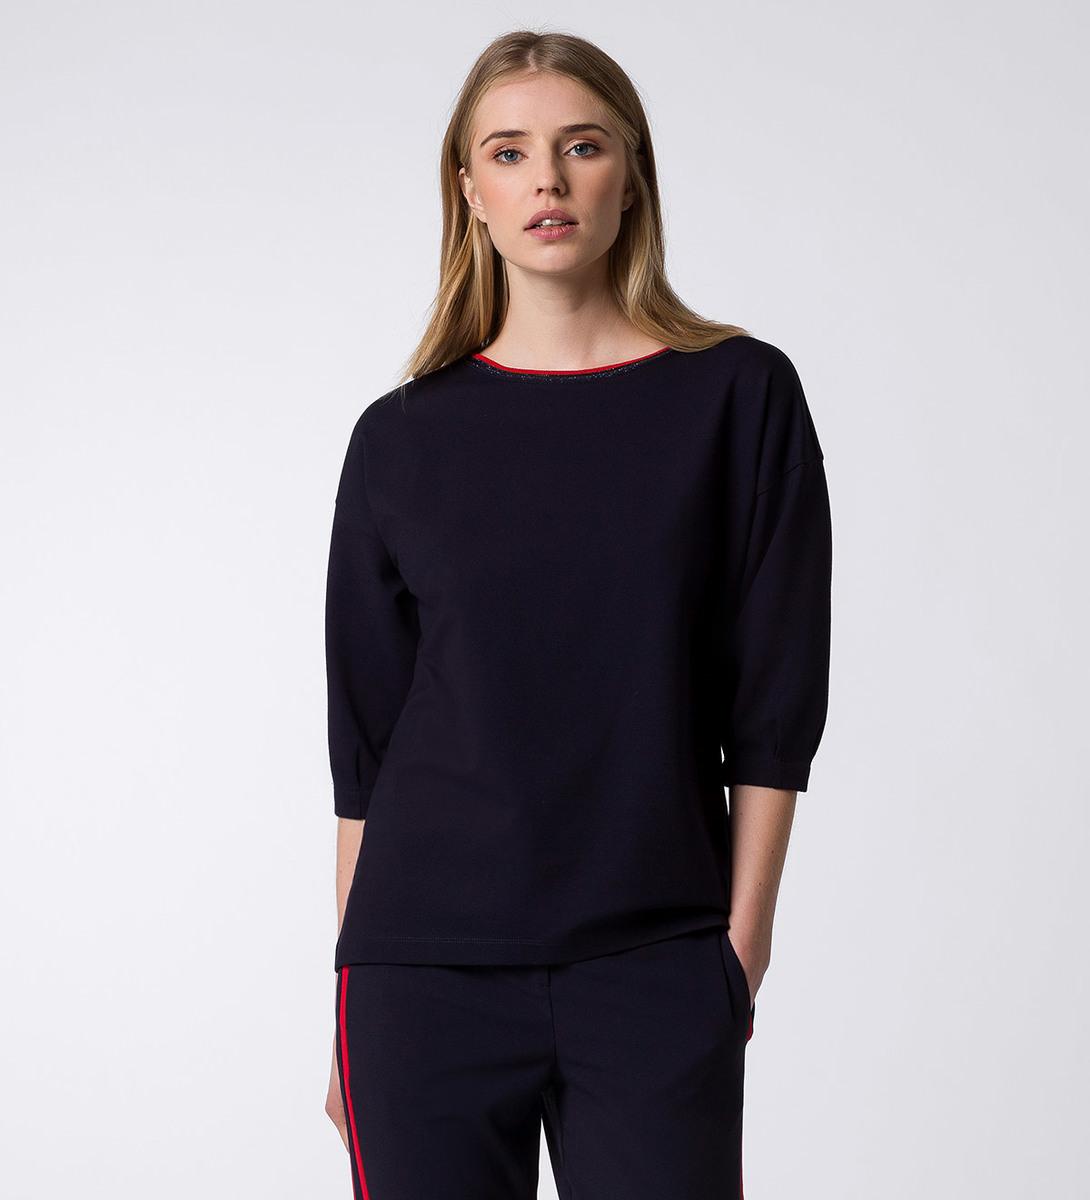 Jerseysweater mit Glitzerdetail in blue black